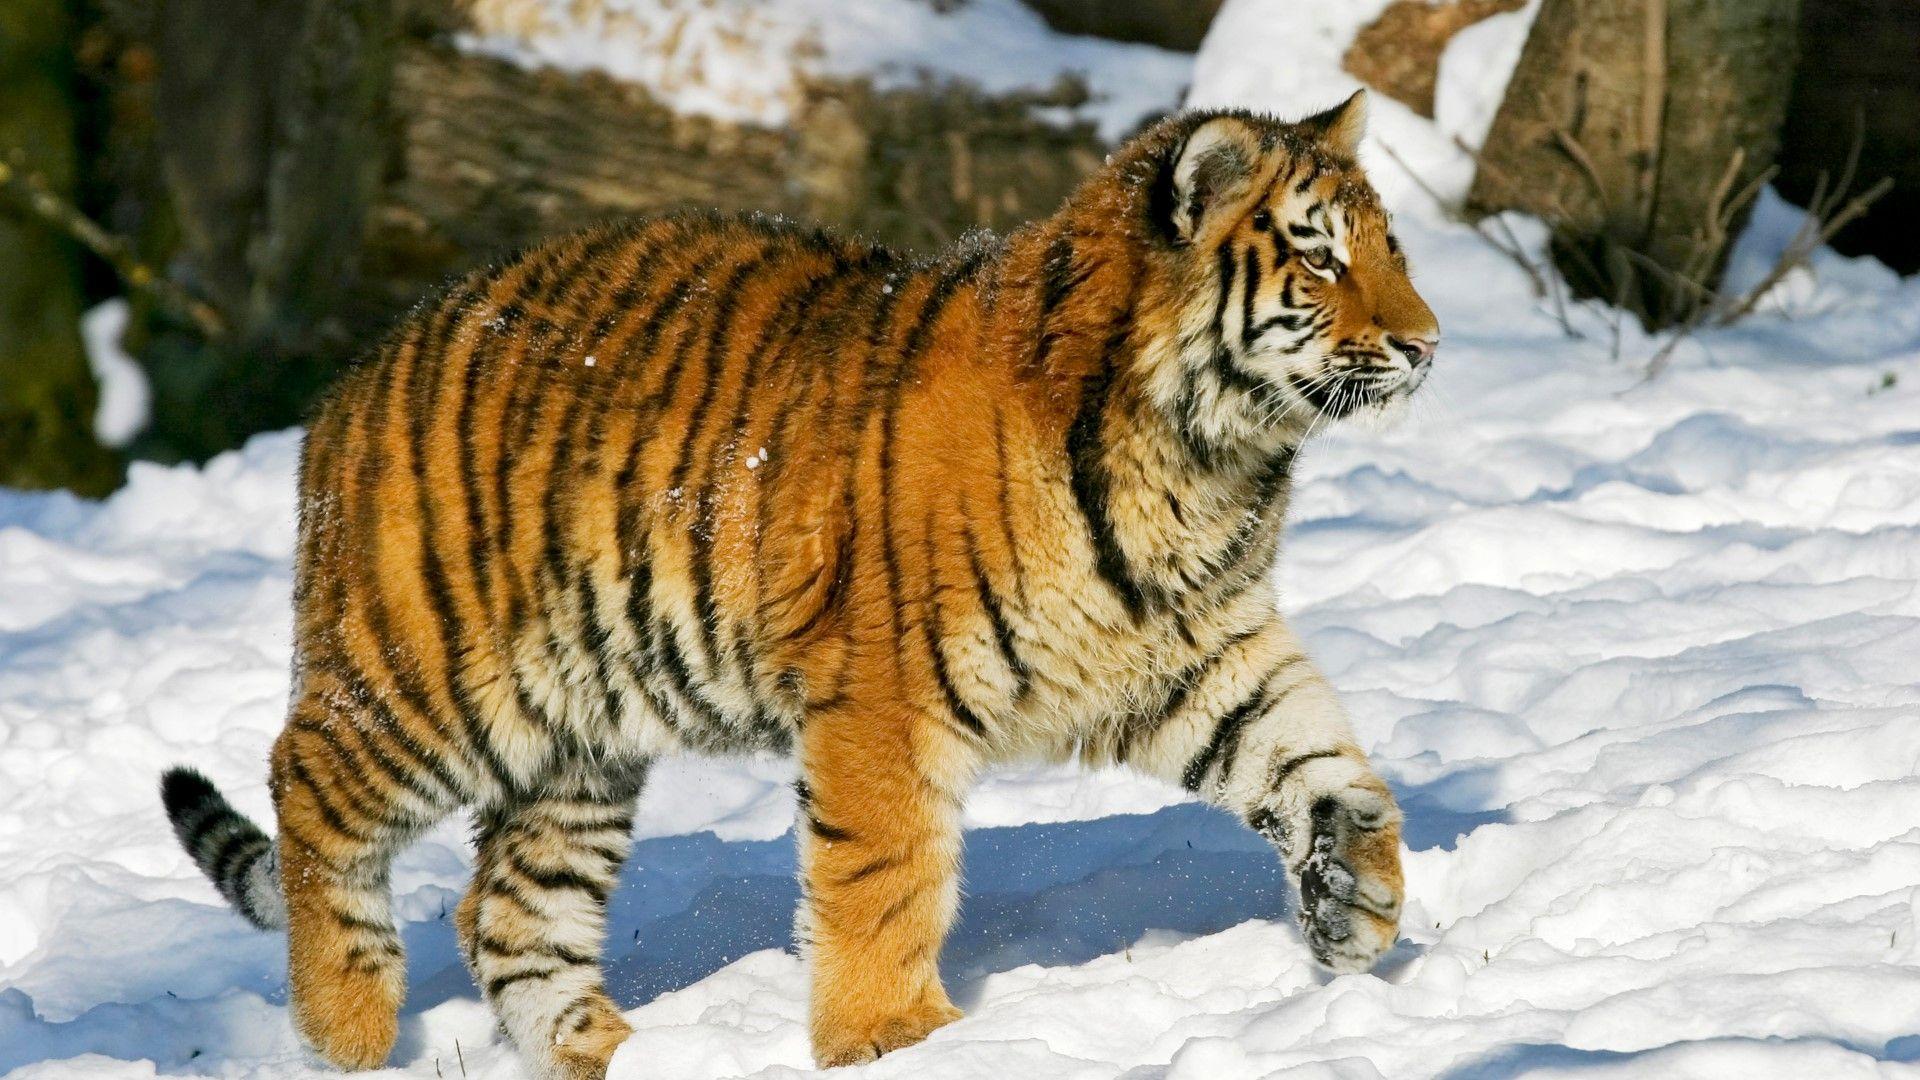 Windoes Wallpaper Smoll Tiger 1920x1080 Siberian Tiger Tiger Panthera